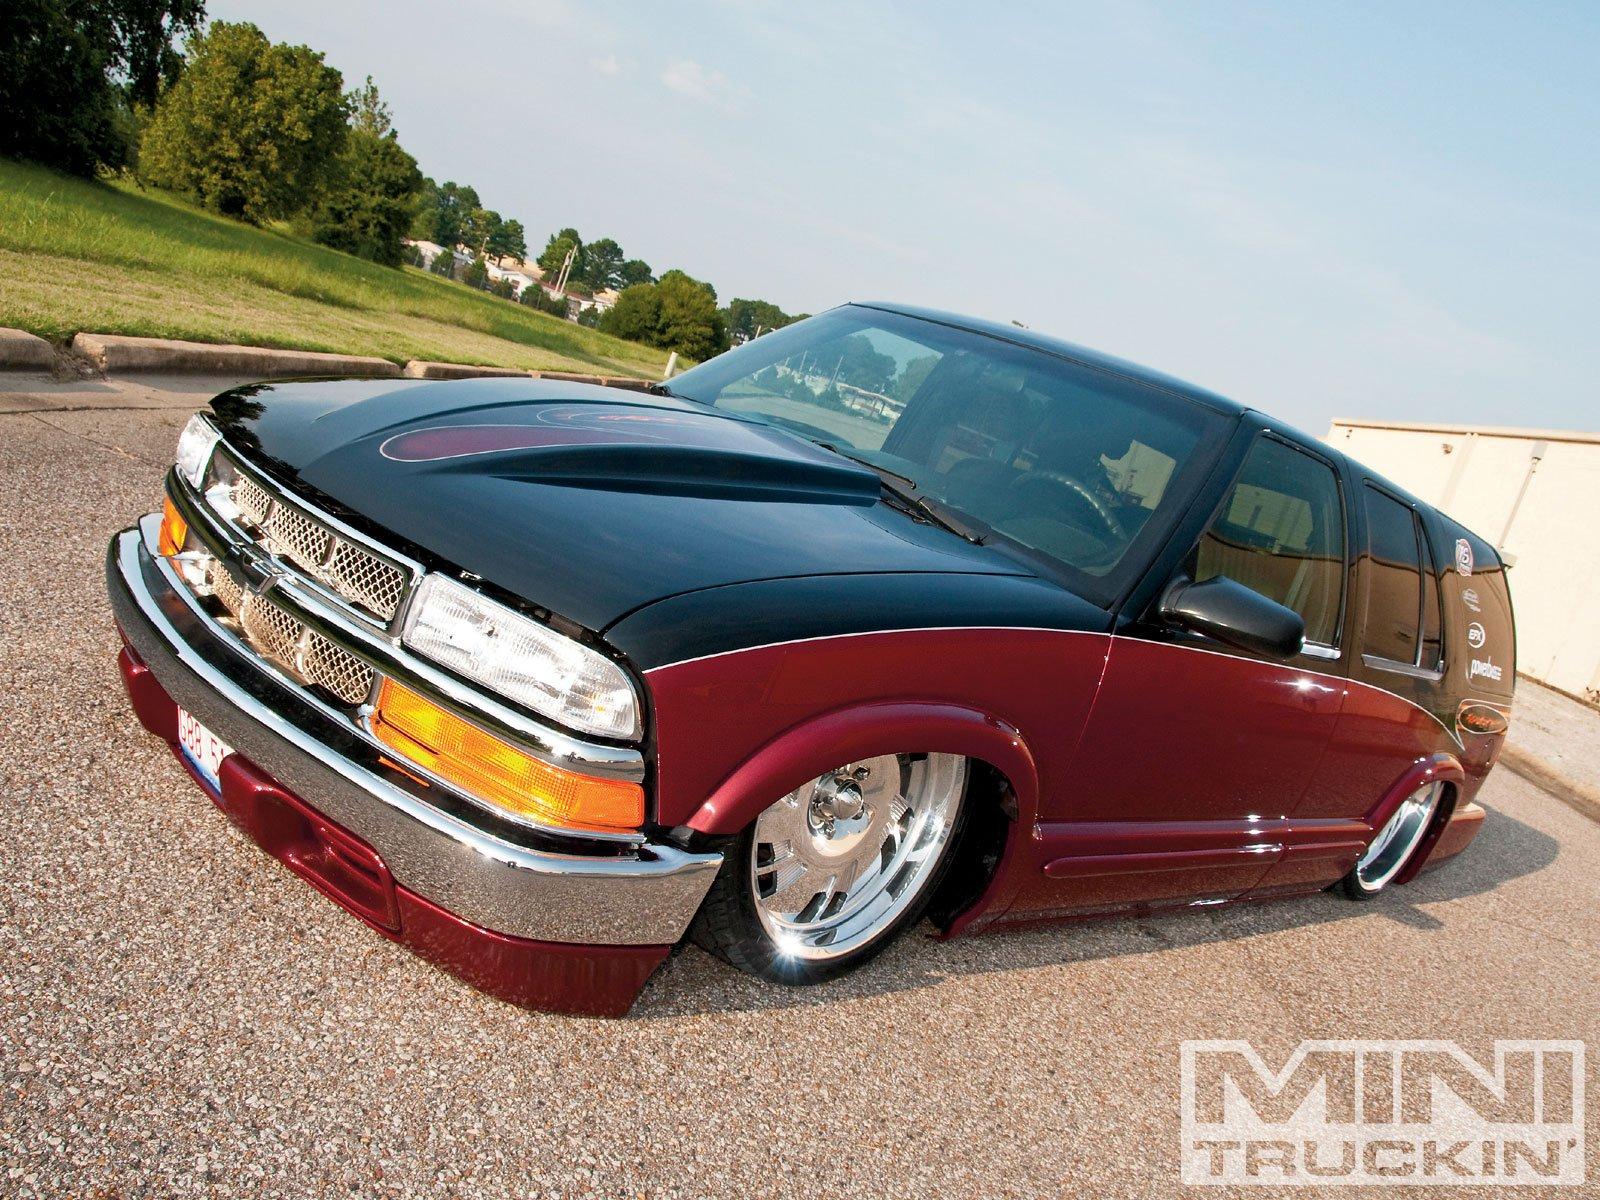 Chevrolet Blazer Suv 4x4 Truck Custom Tuning Lowrider Hot Rod Rods Wiring Harness Wallpaper 1600x1200 775081 Wallpaperup